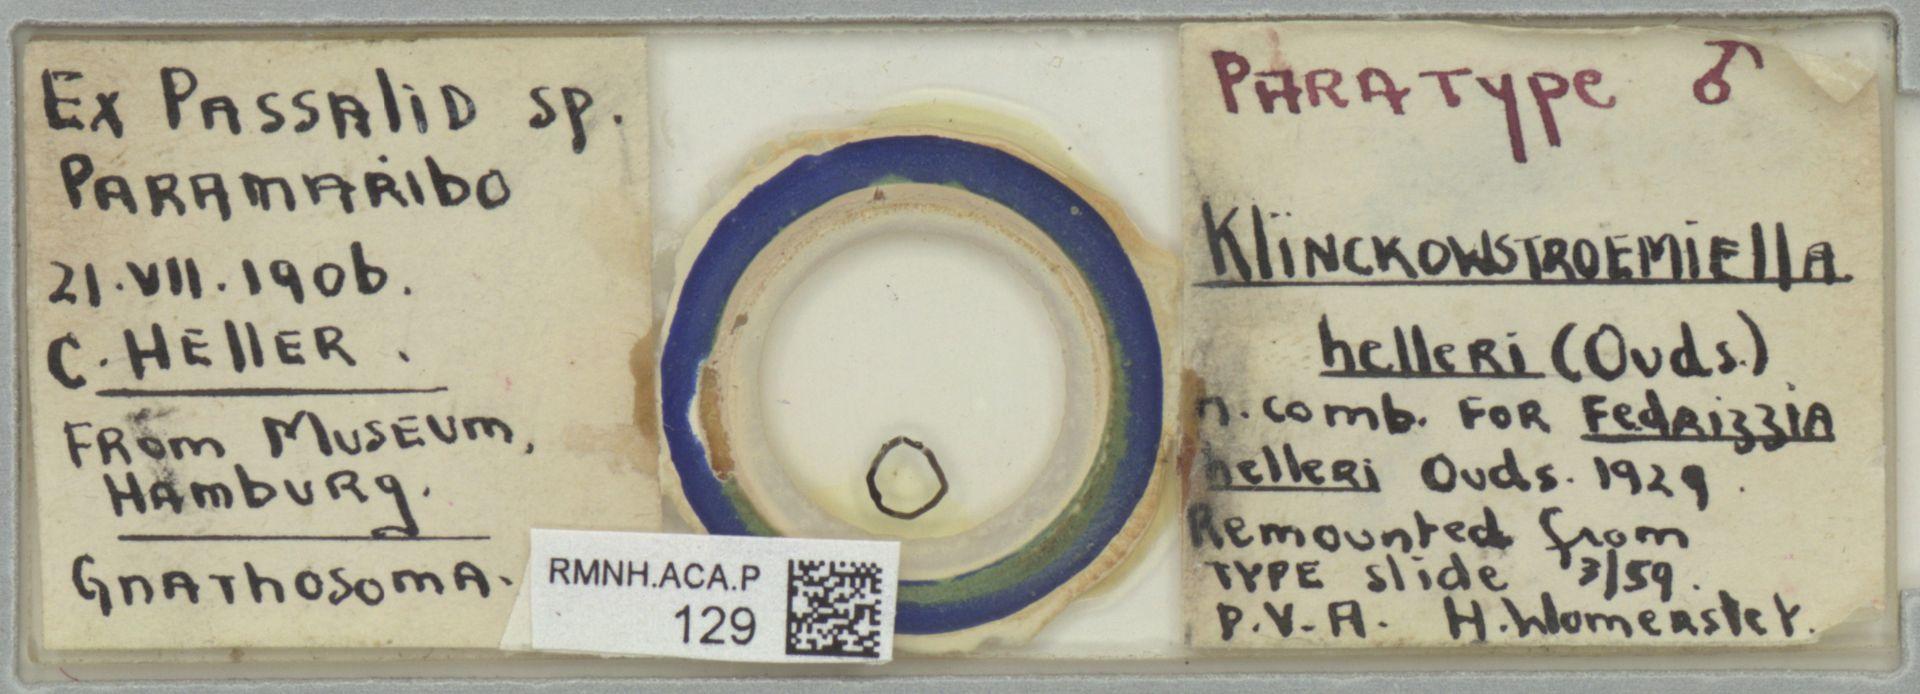 RMNH.ACA.P.129   Klinckowstroemiella helleri Oudemans